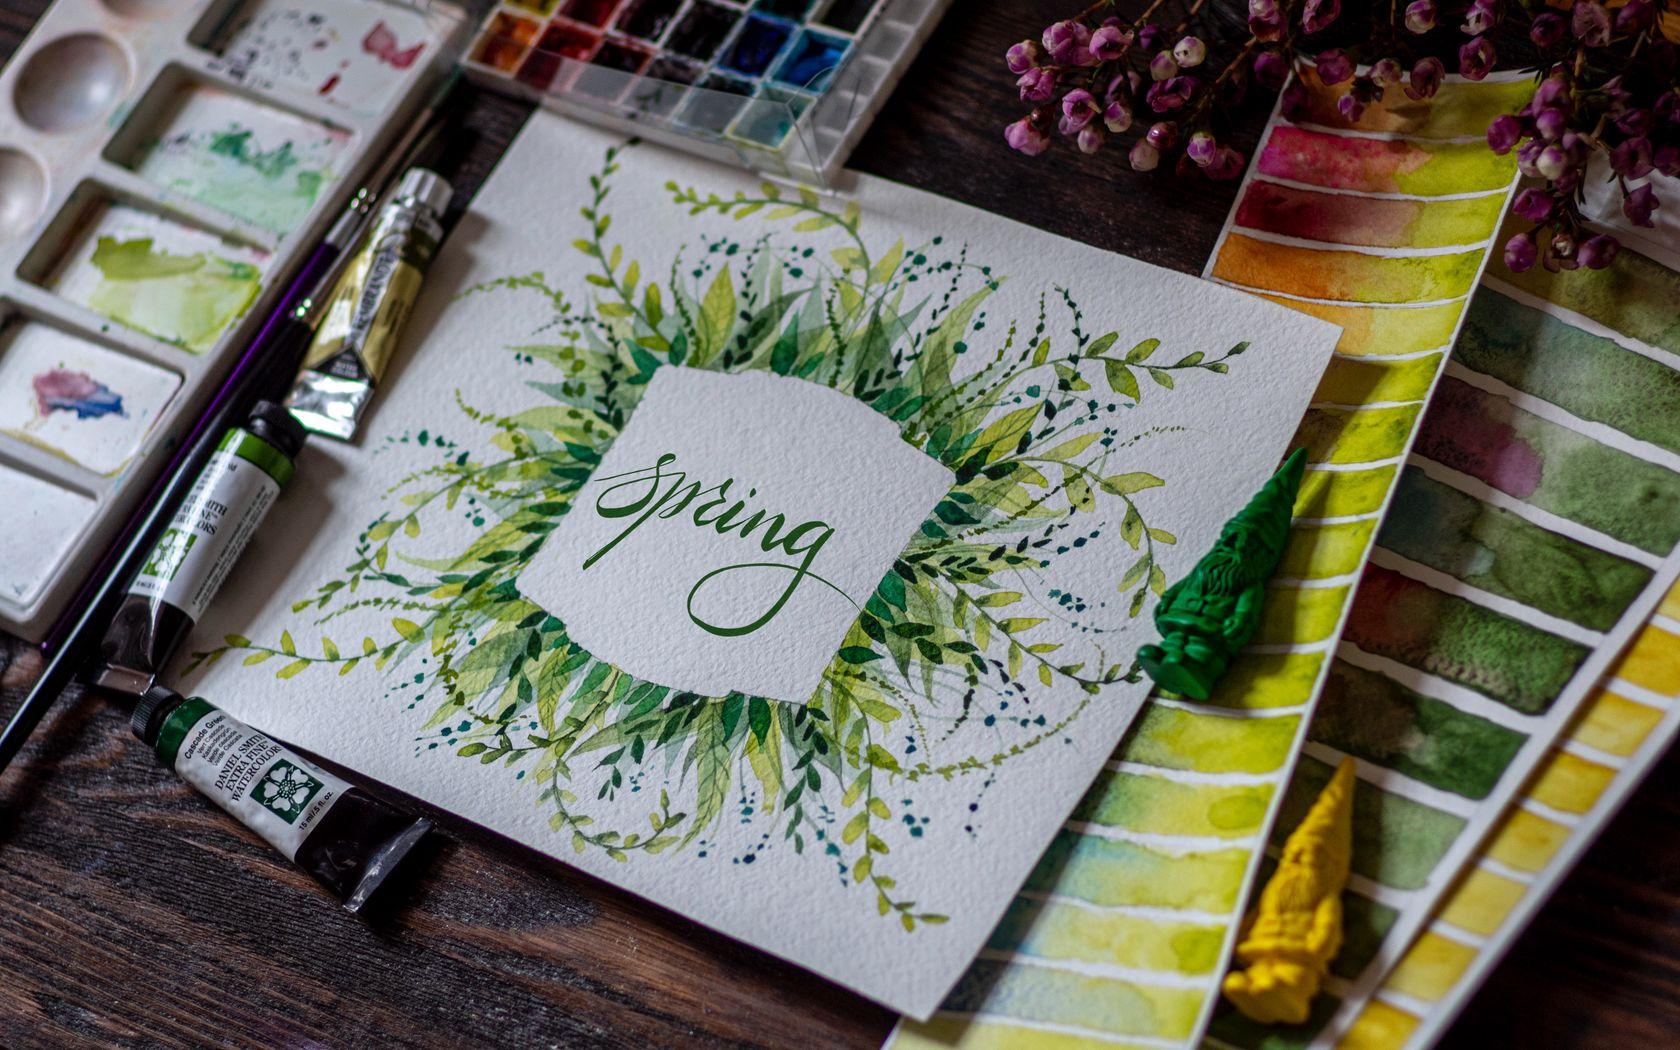 1680x1050 Обои весна, слово, леттеринг, краски, акварель